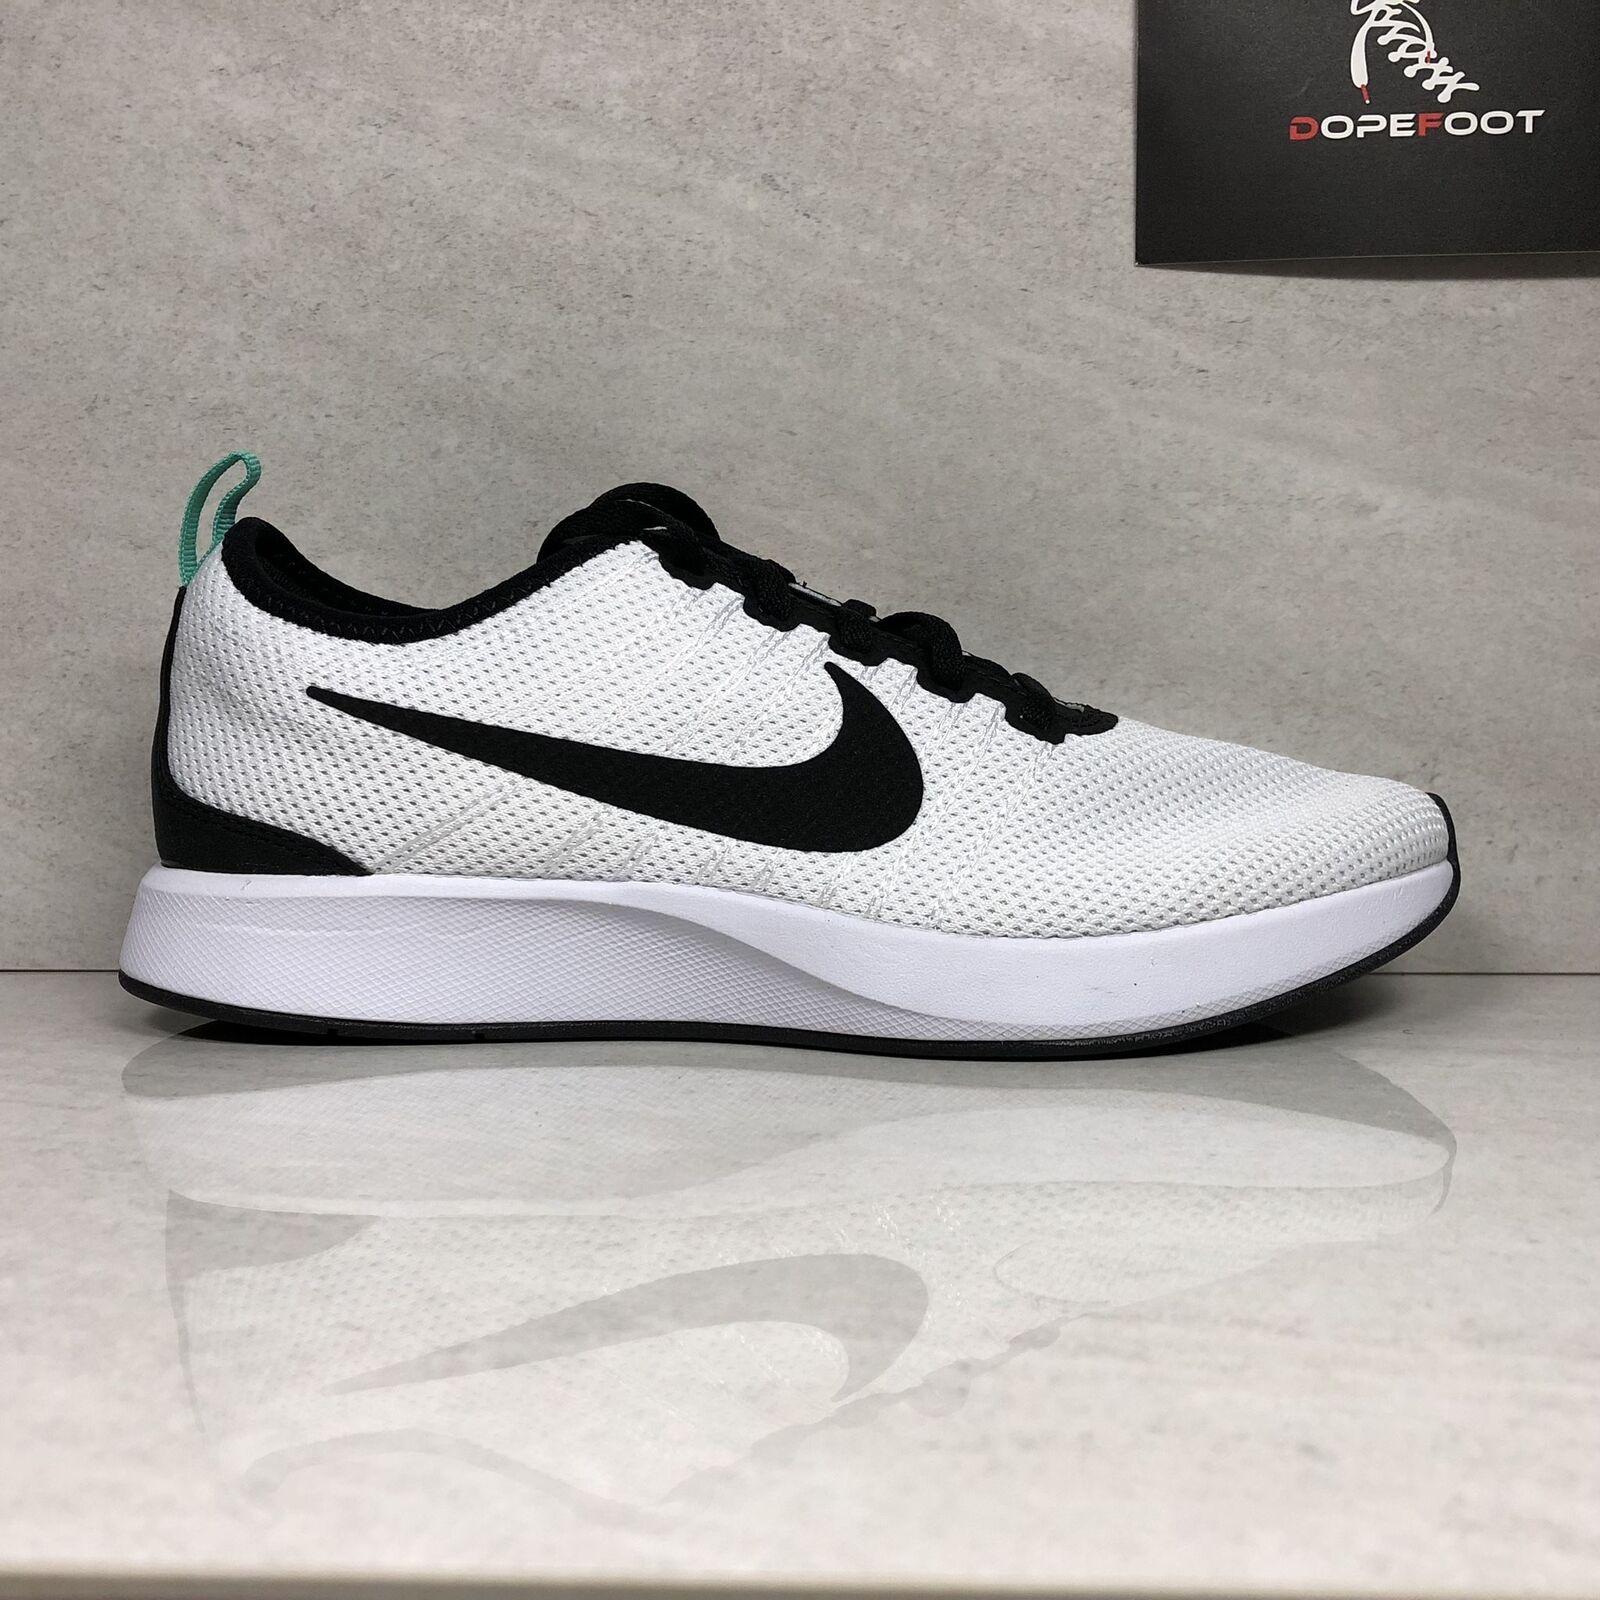 DS Nike Dualtone Racer 918227 Size 8.5/Size 11.5 White/Black 918227 Racer 100 157e53